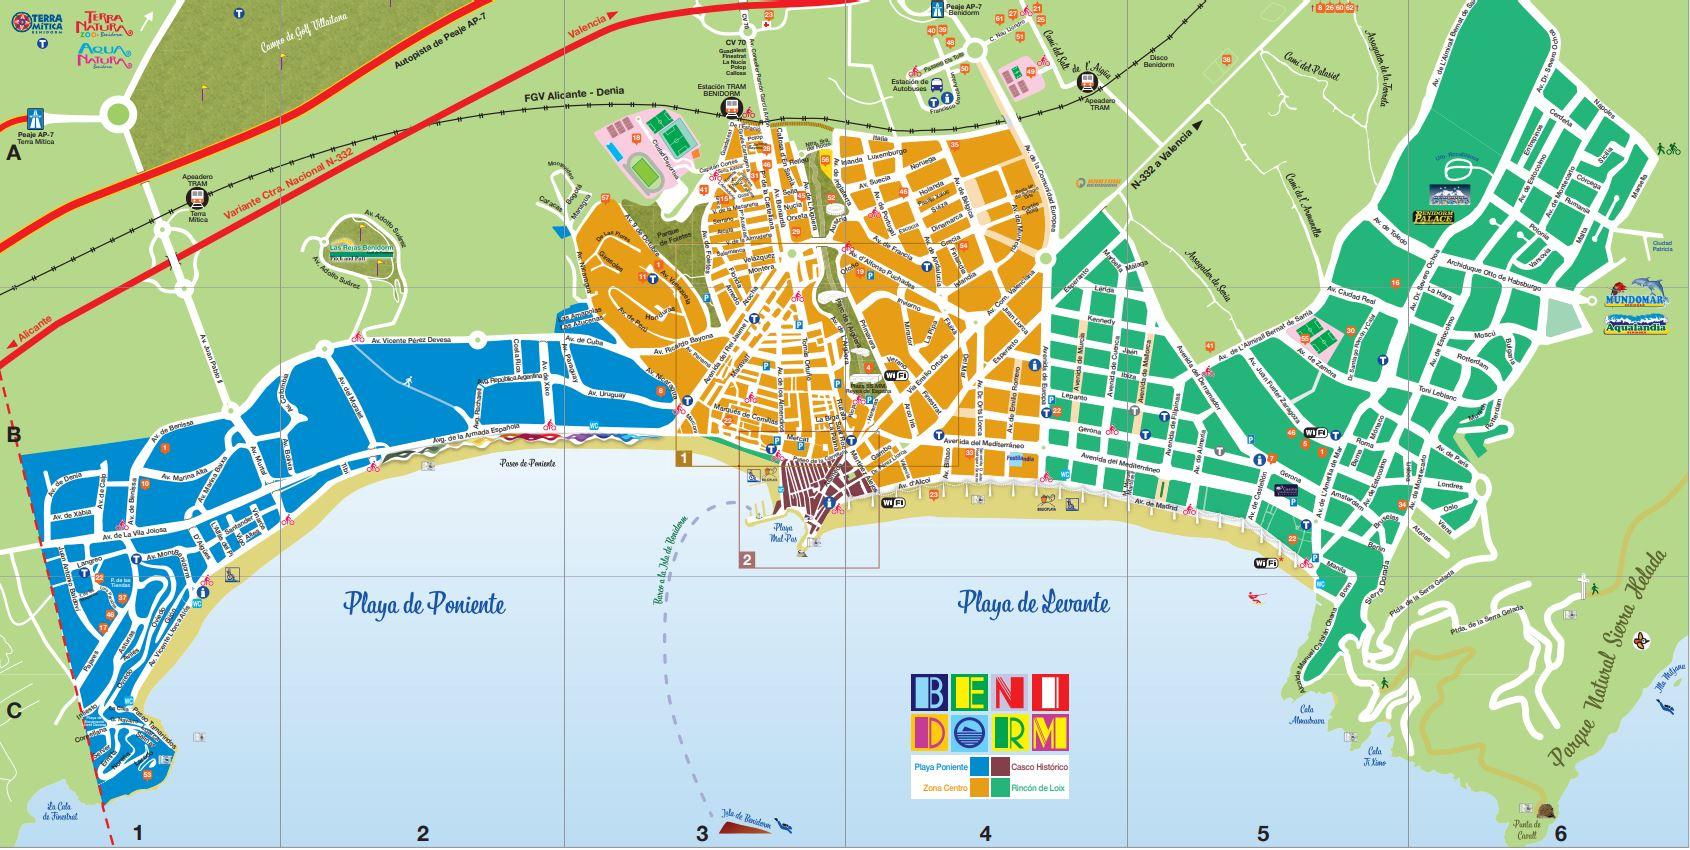 Mapa Benidorm Plano Ciudad B2B viajes